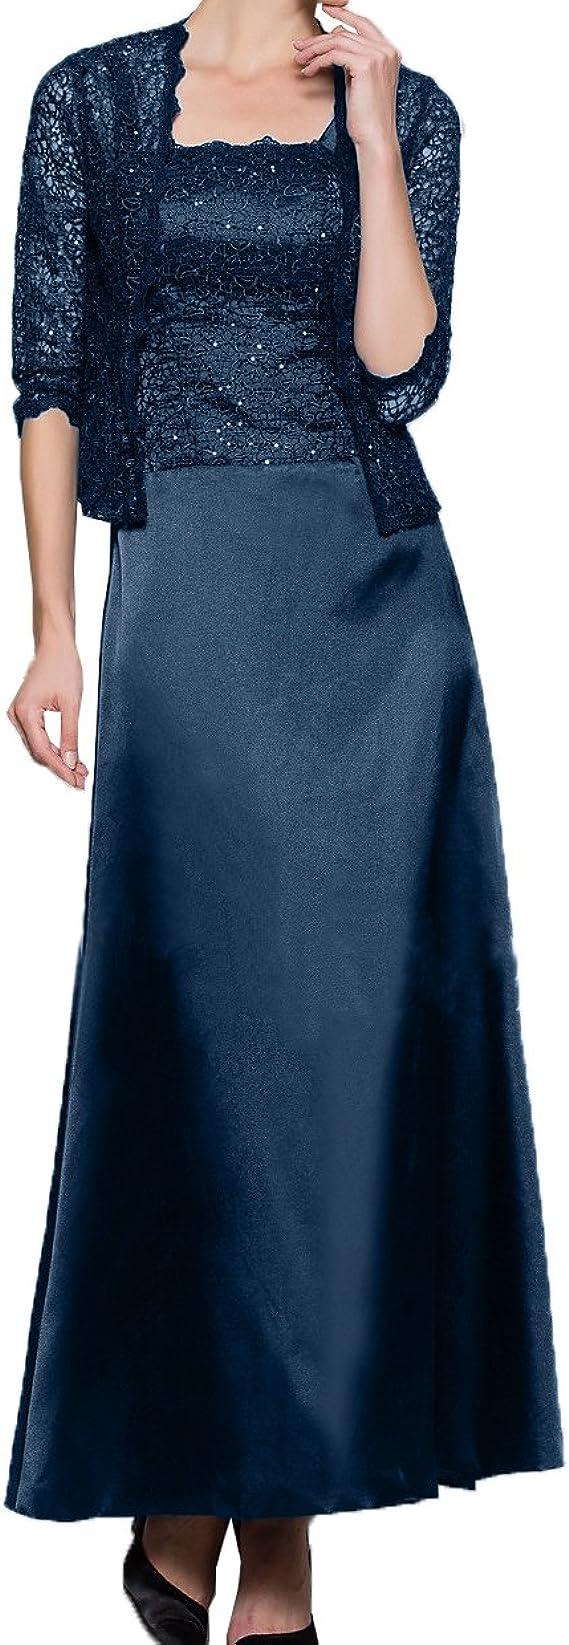 Royaldress Knoechellang Ballkleider Abendkleider Elegant Lang 2019 Kleid Fuer Brautmutter Mit Bolero 44 Navy Blau Amazon De Bekleidung